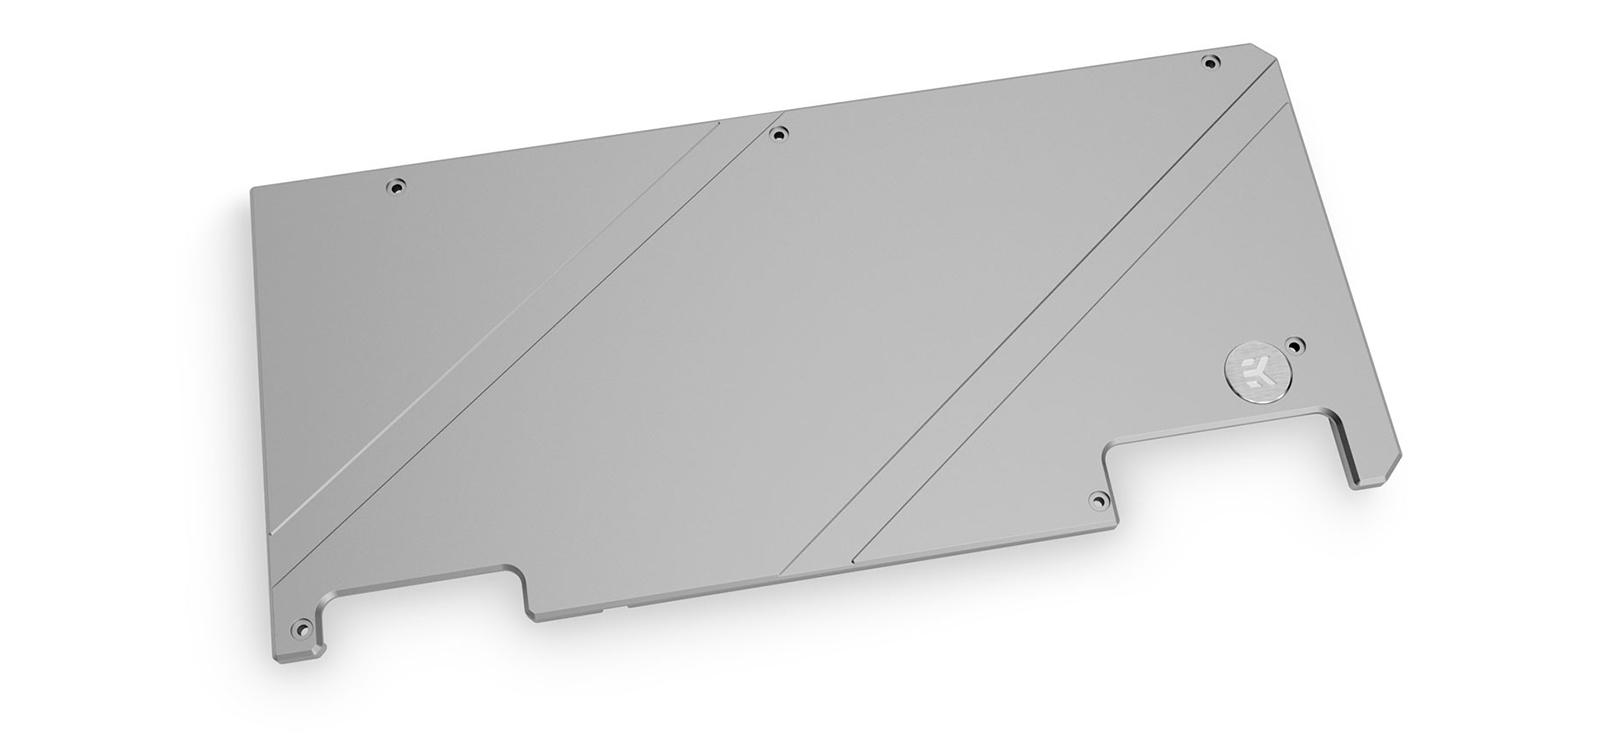 EK-Quantum Vector Strix RTX 3070/3080/3090 Backplate - Nickel1